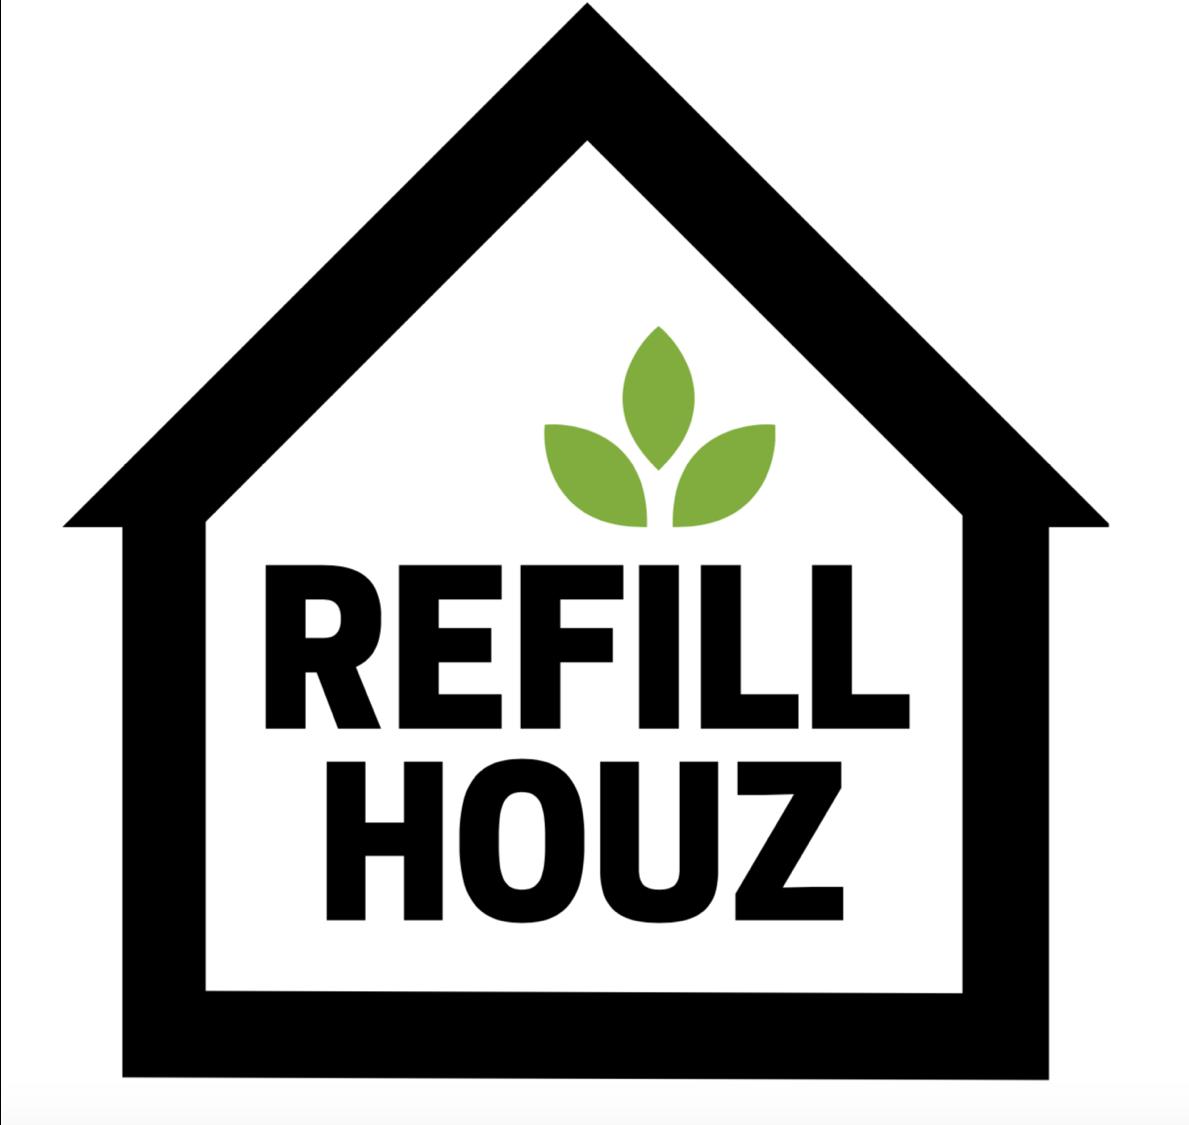 Refill Houz